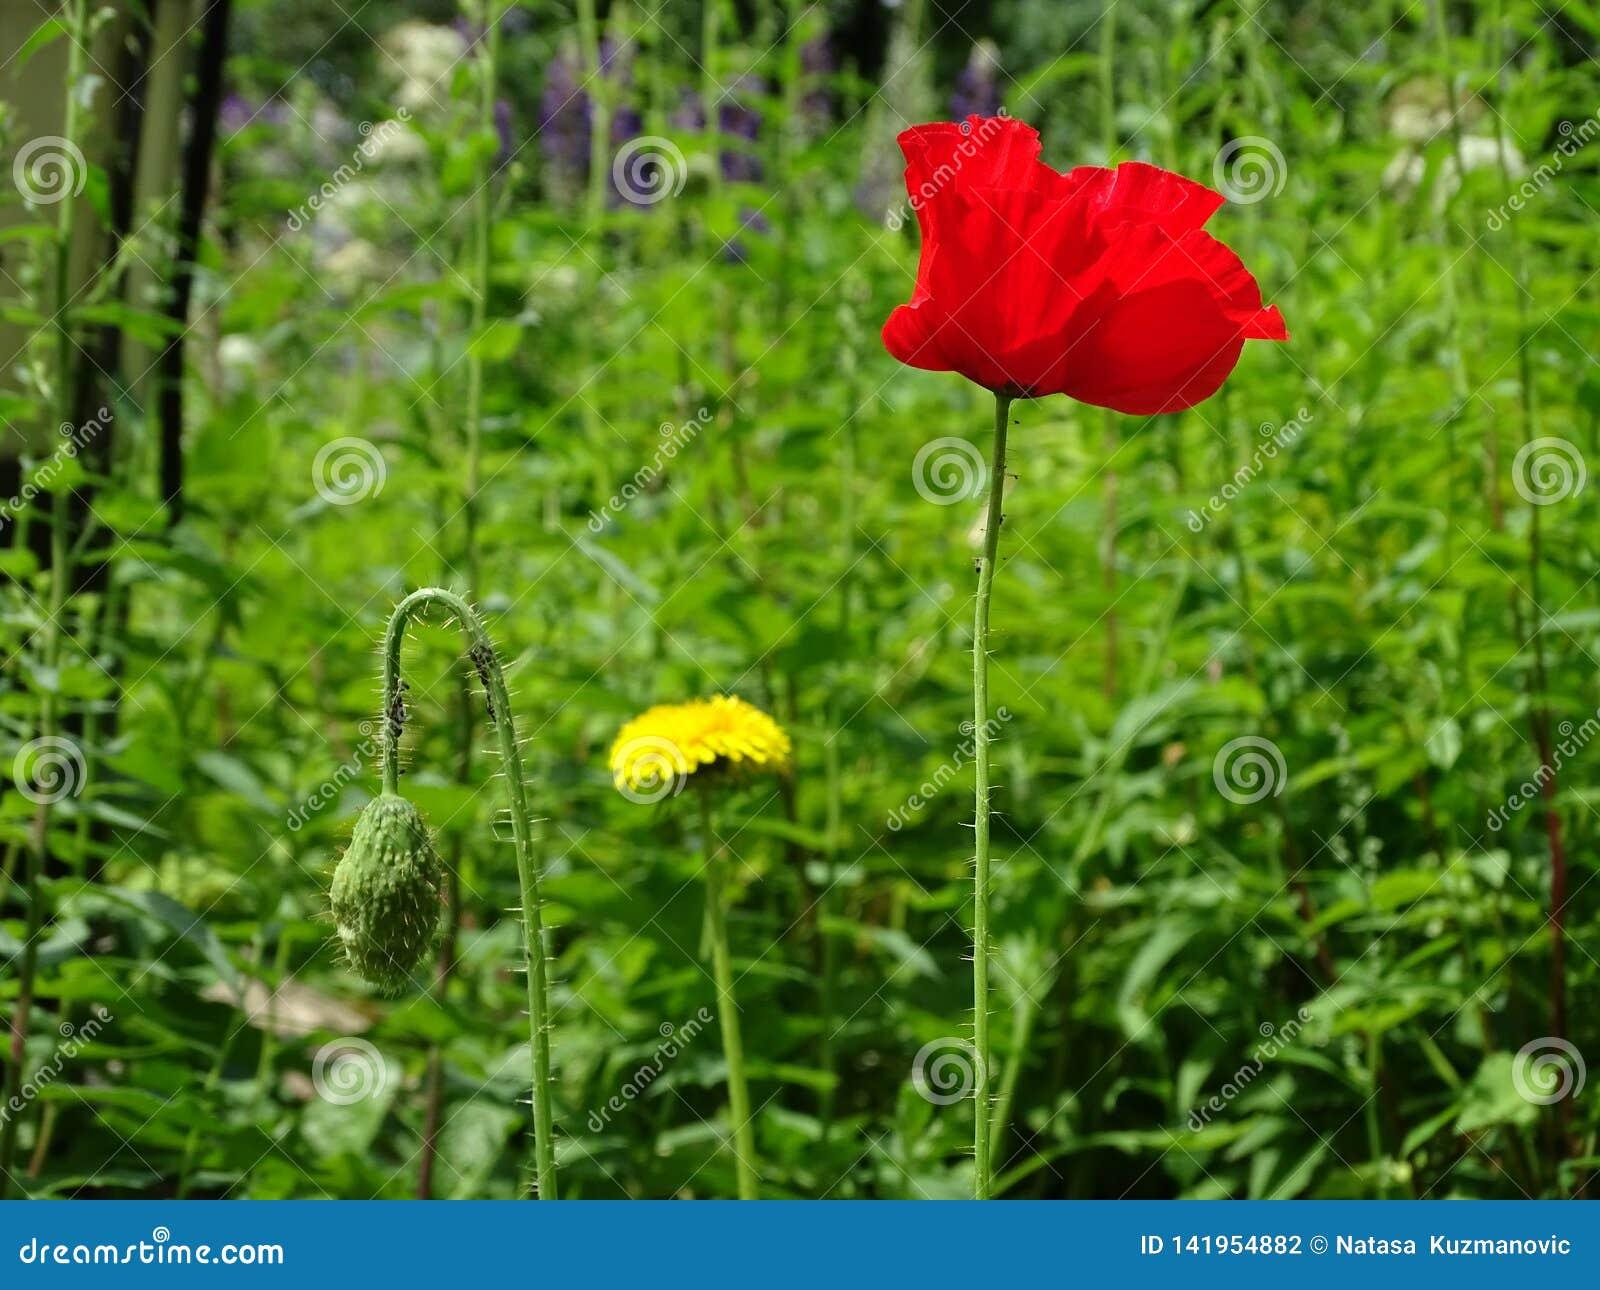 Mooie rode dichte omhooggaand van de papaverbloem in het groene gras